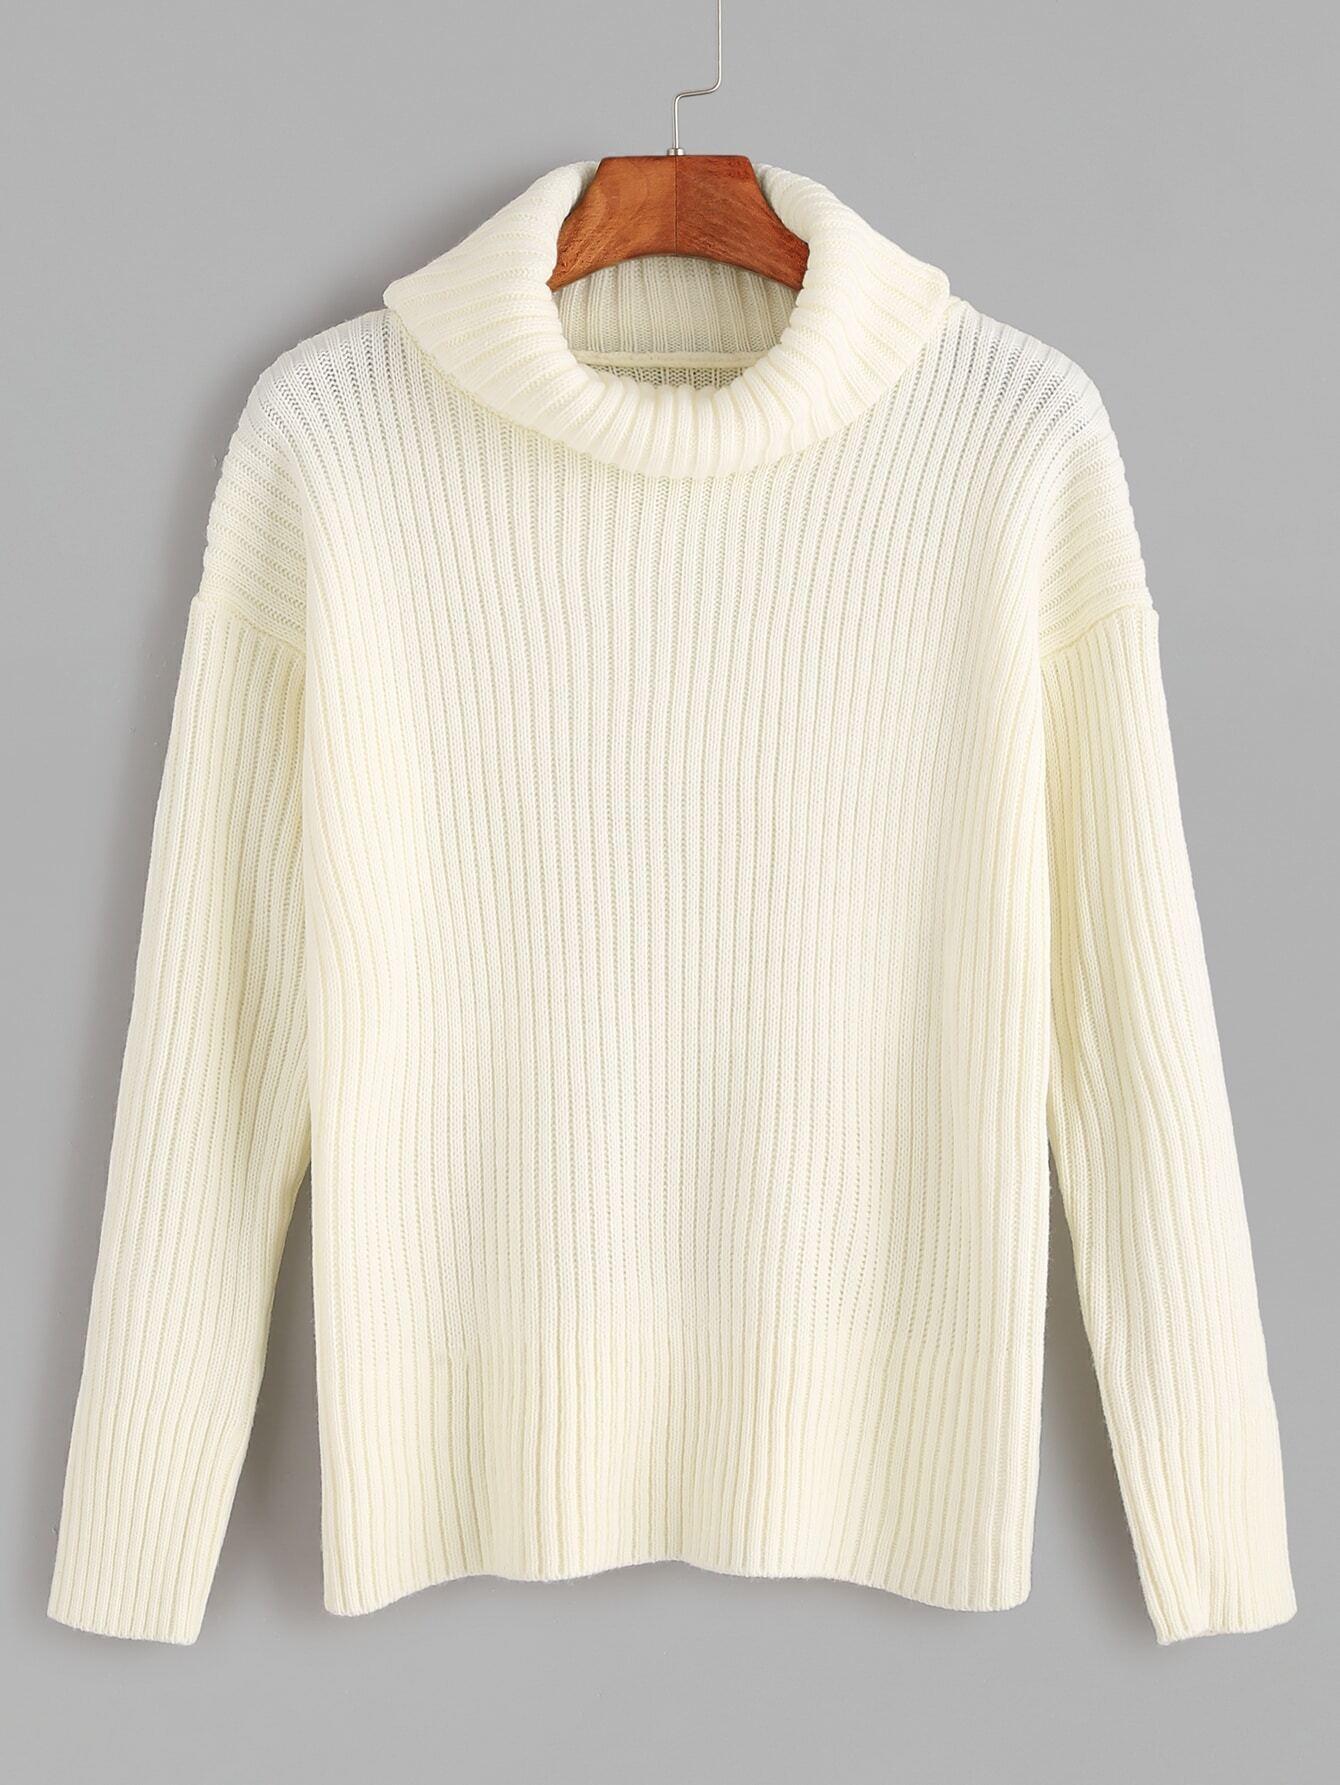 White Turtleneck Knit Sweater 108